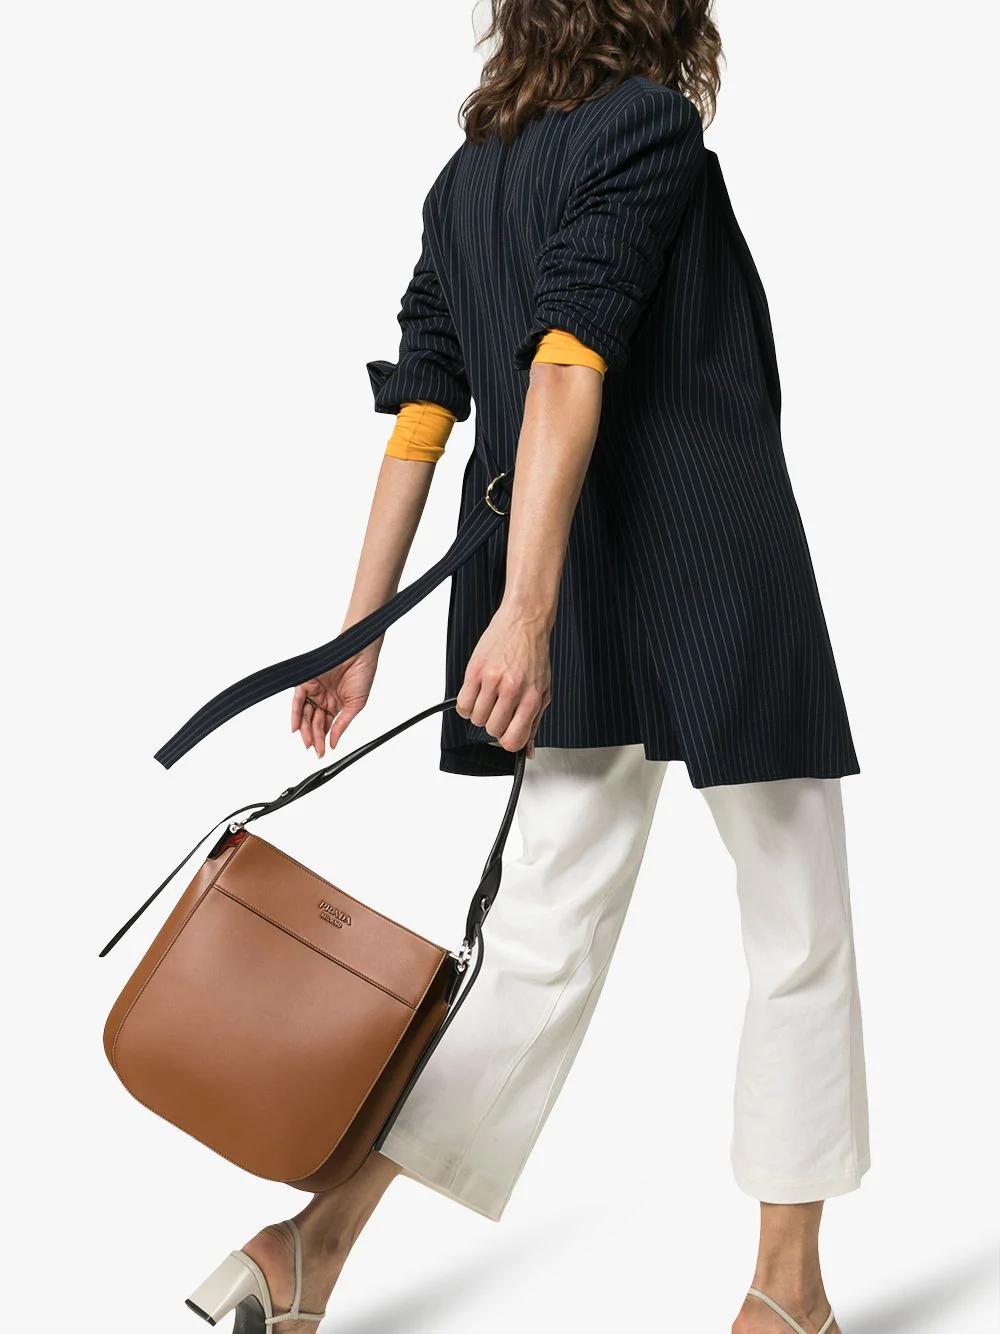 6f772f9a78c3 Prada Margit Leather Shoulder Bag In Brown